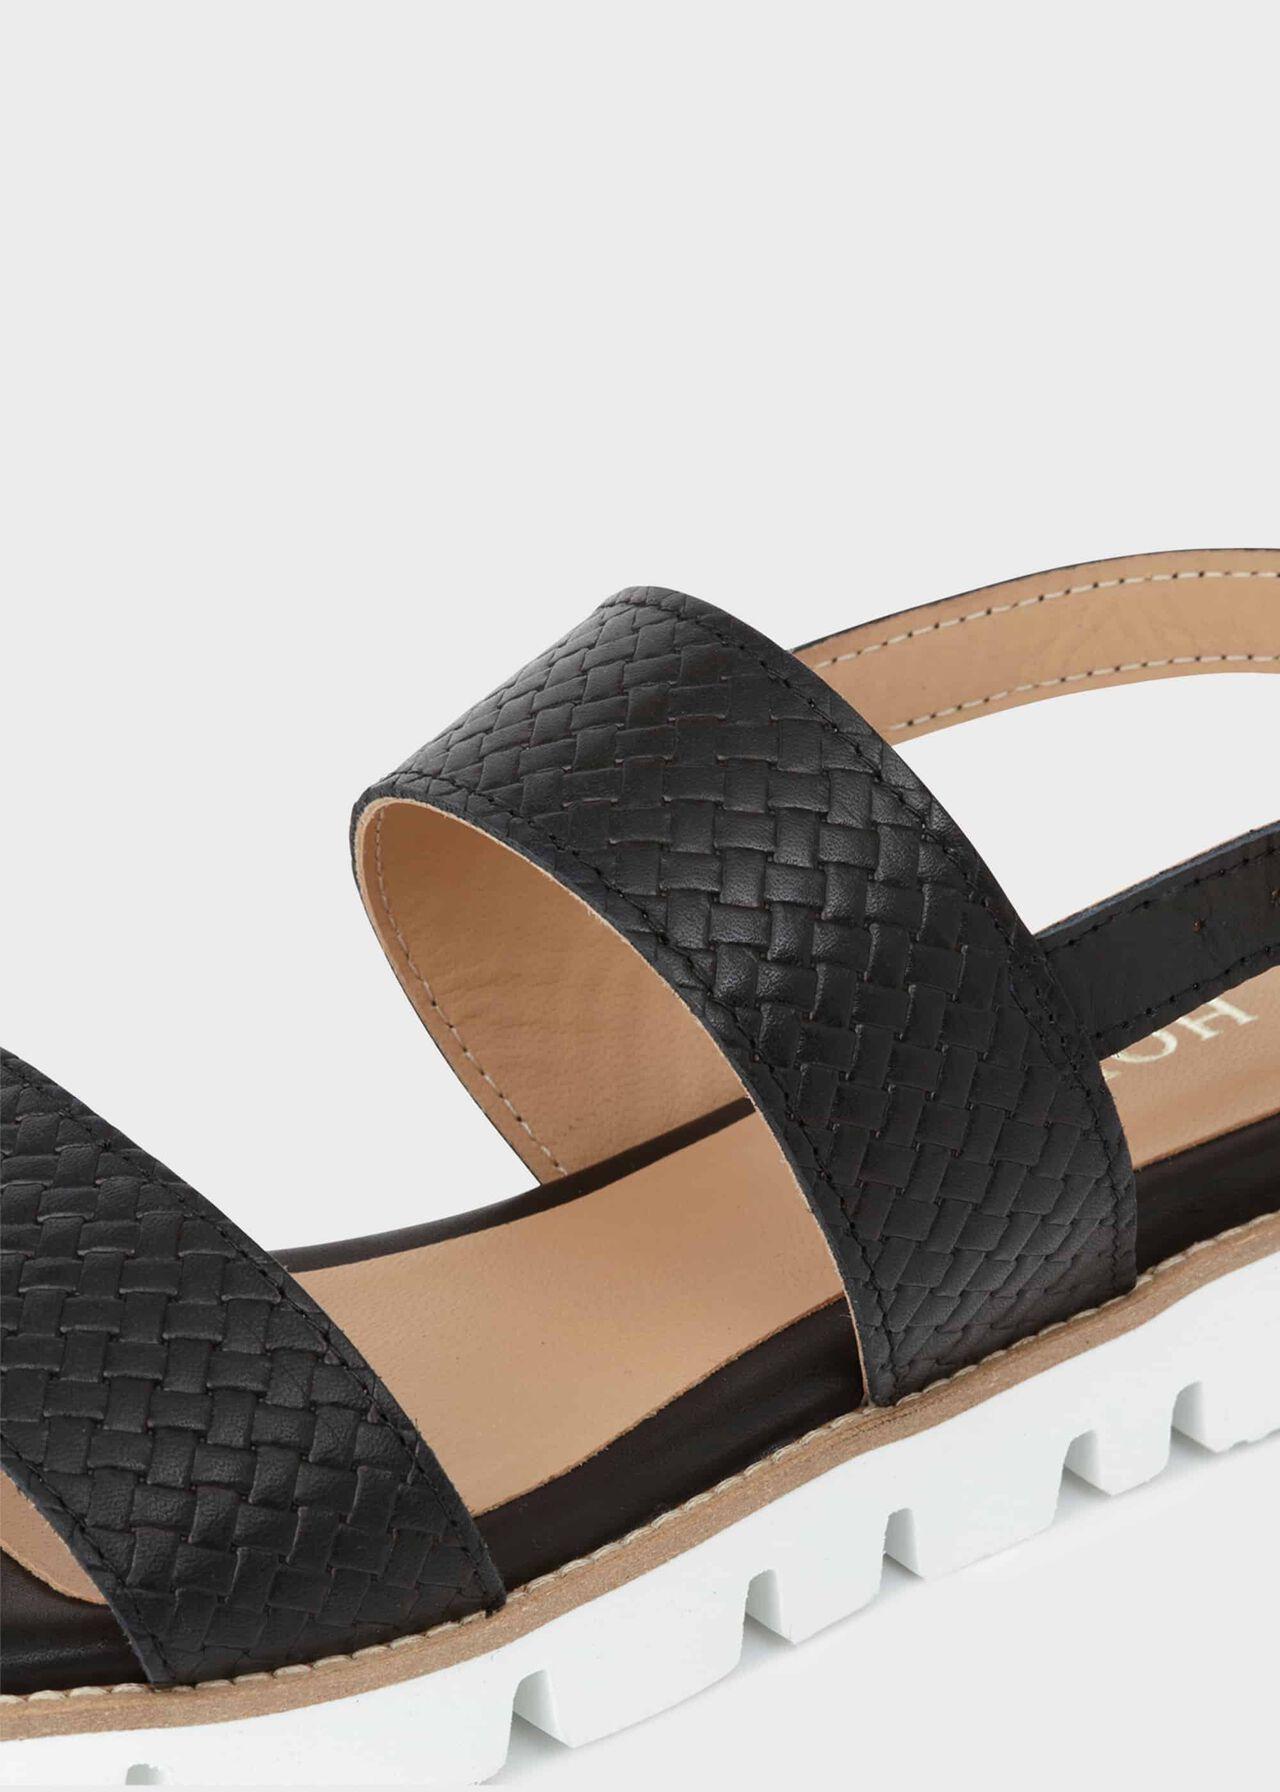 Katie Leather Sandals, Black, hi-res